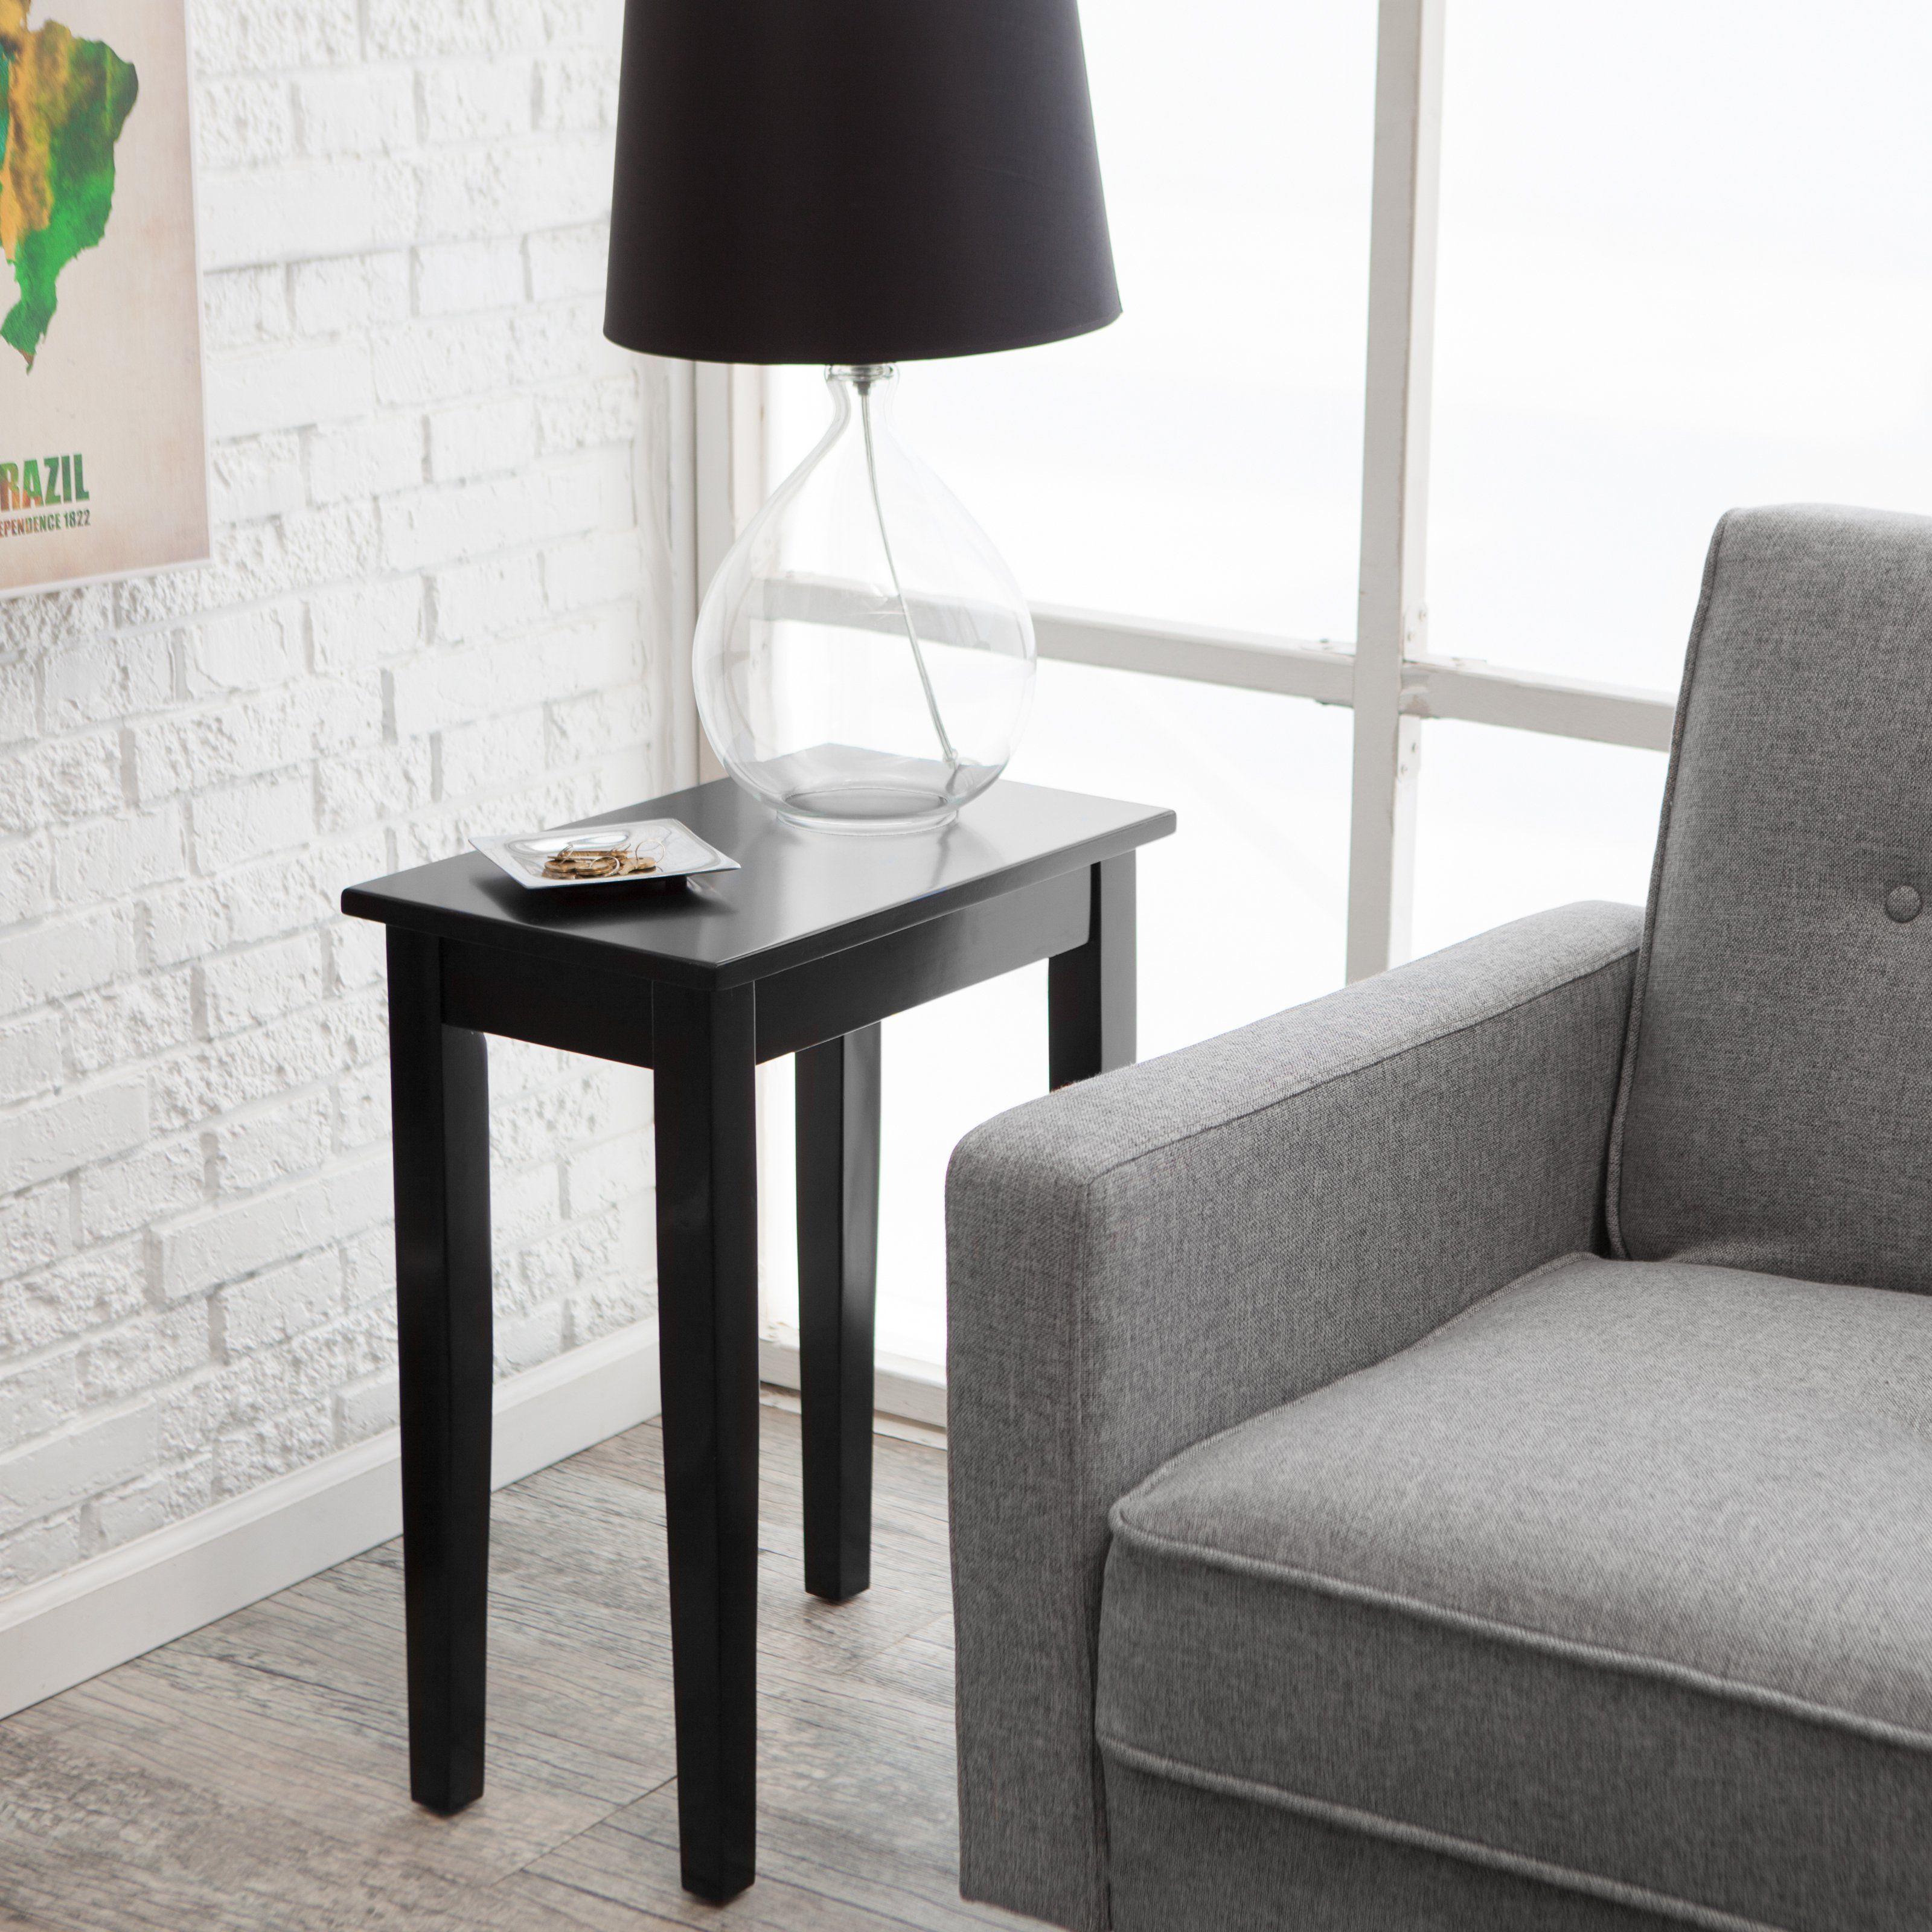 Have to have it. Turner Chair Side Table - Black - $64.99 @hayneedle ...